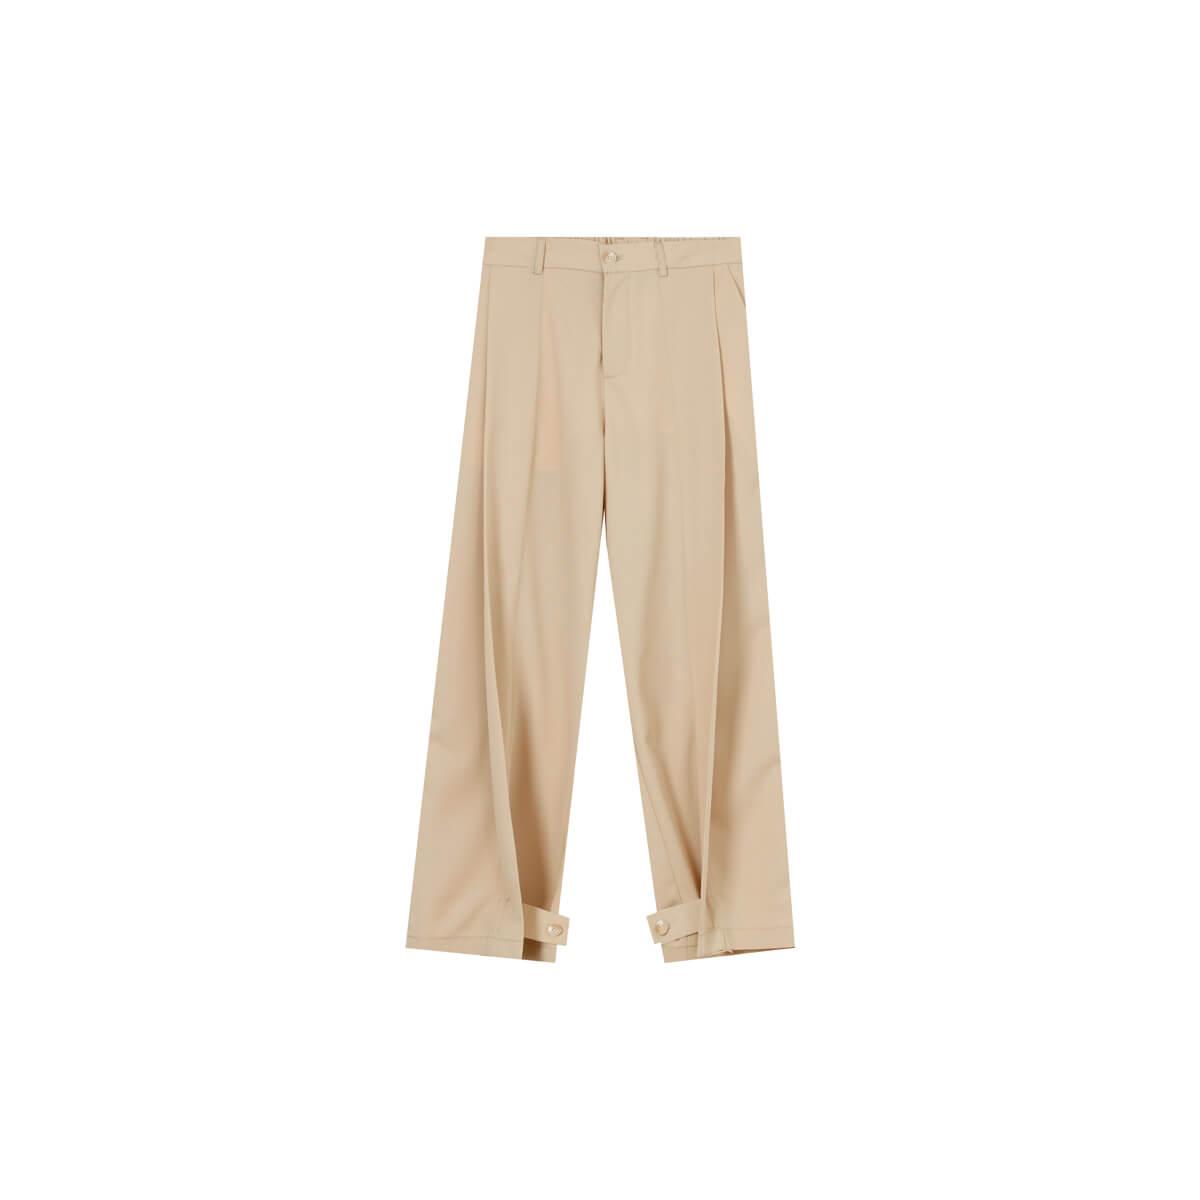 Брюки Cui Layout Studio Draped Crumple Trousers Beige